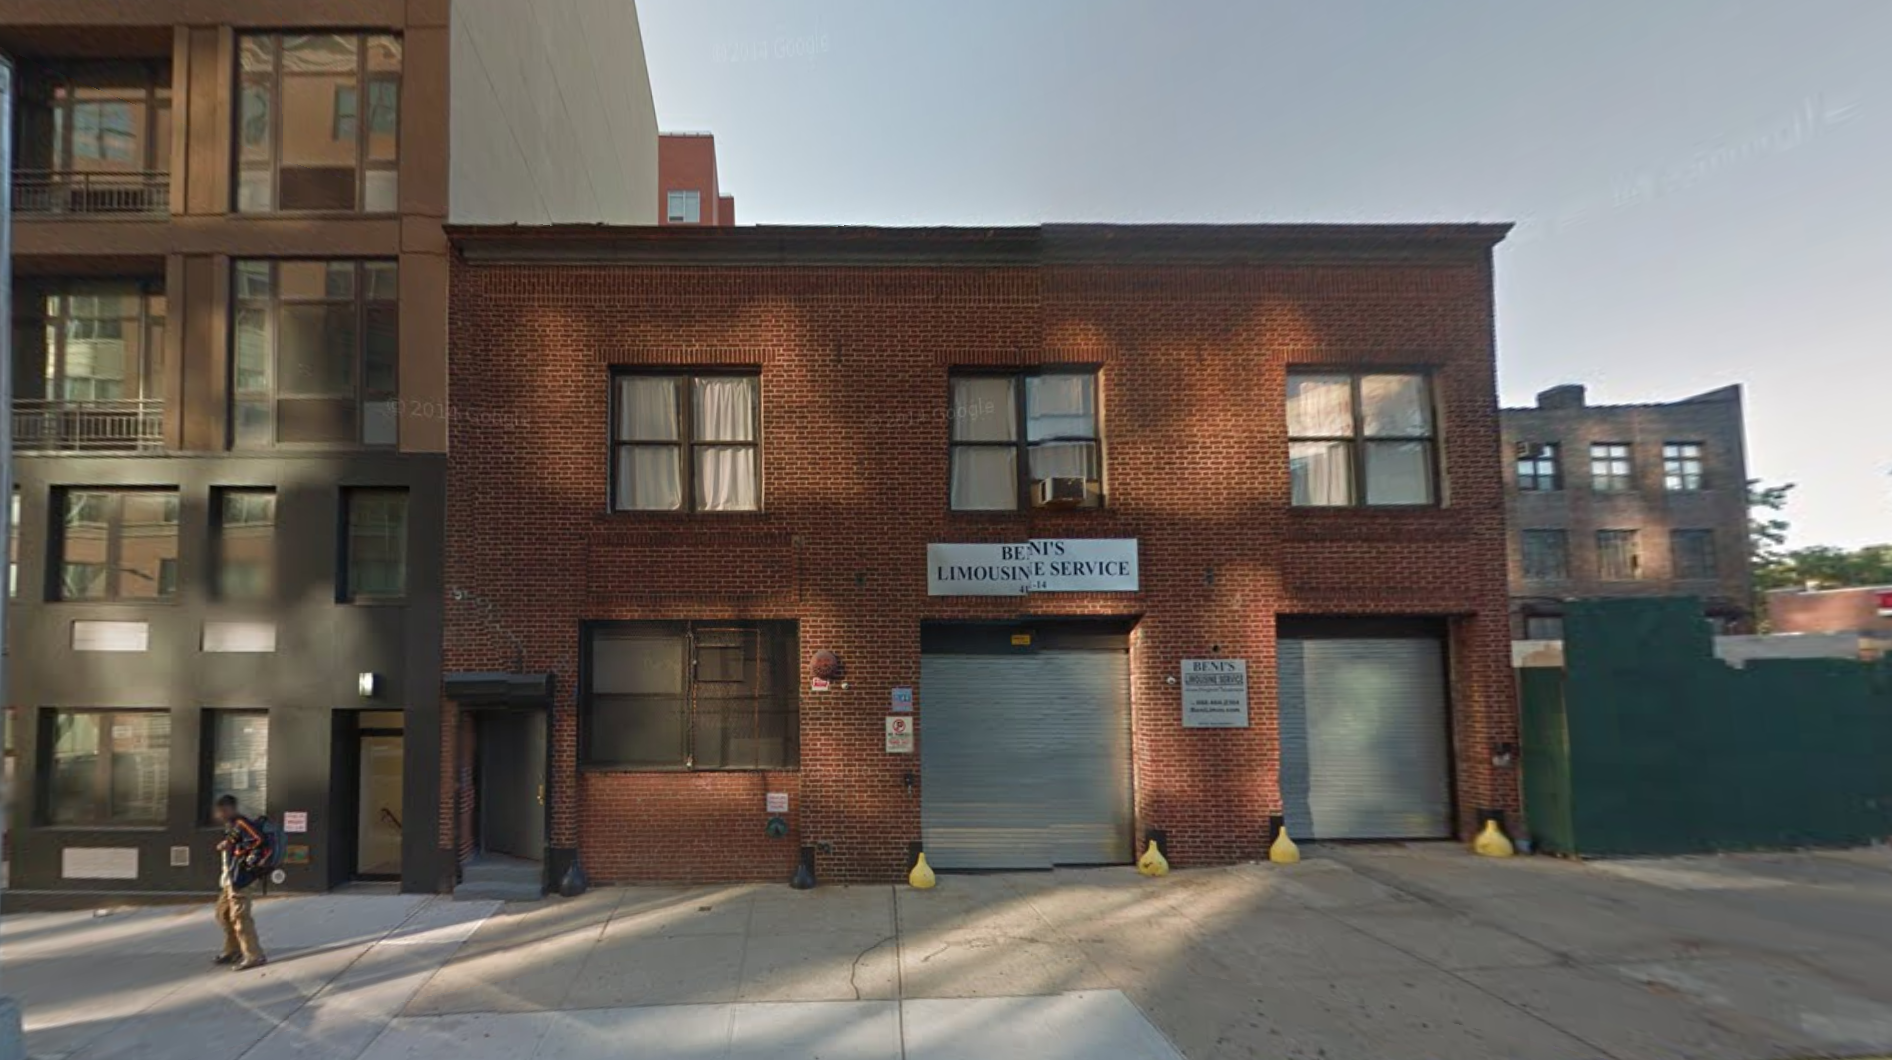 41-14 27th Street, image via Google Maps